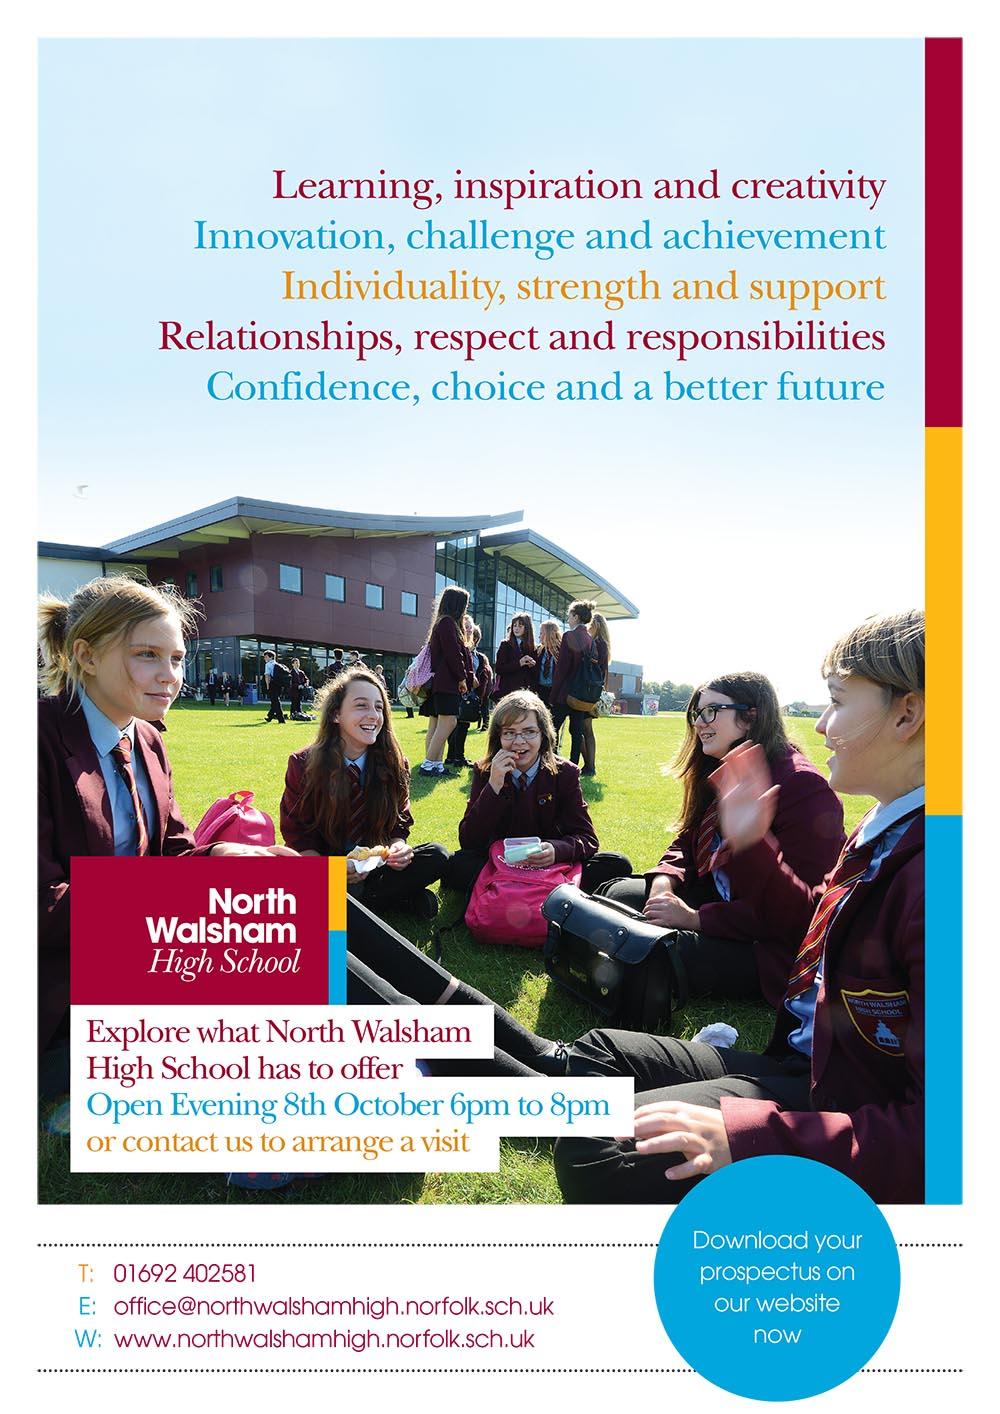 prospectus design for north walsham high school